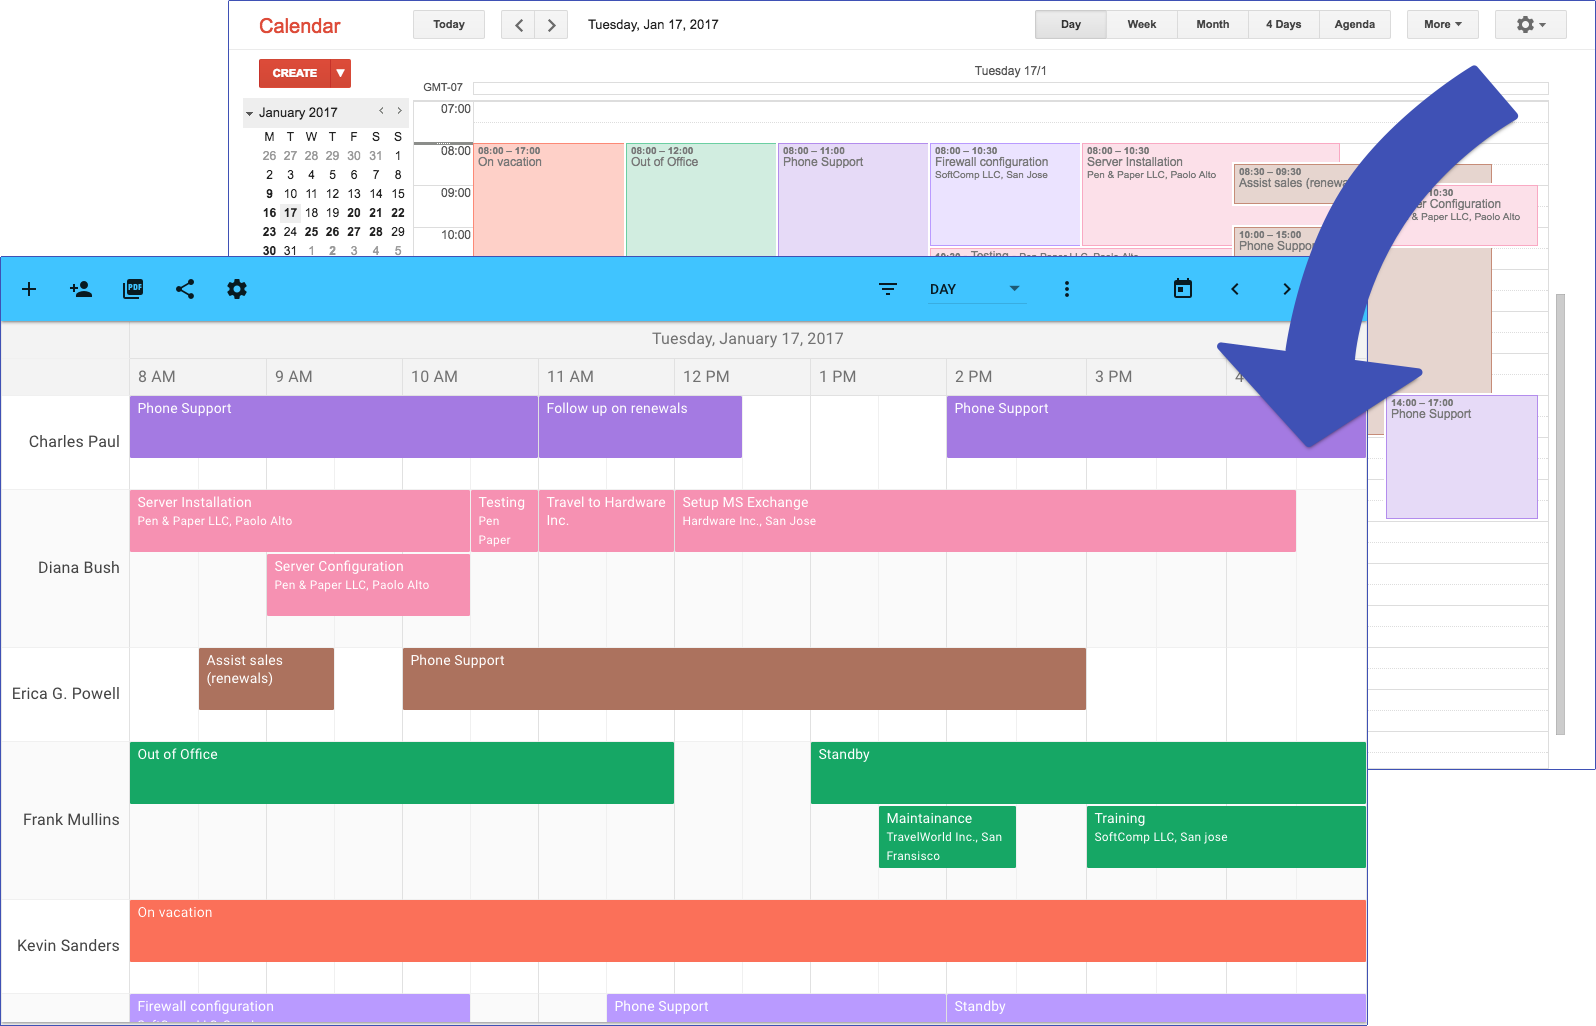 TeamCal – Google Calendar's missing schedule view